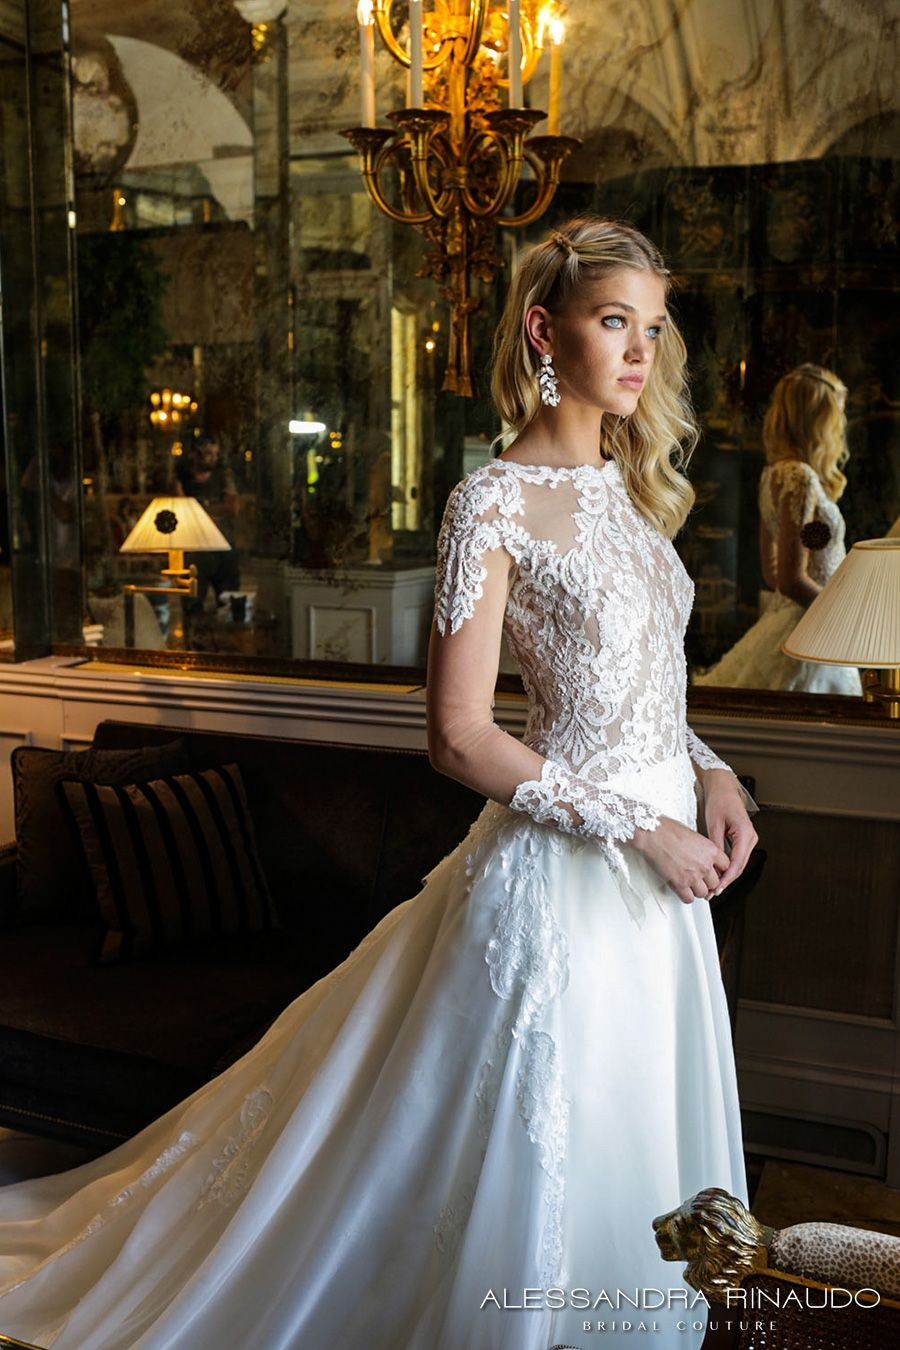 alessandra rinaudo 2017 bridal long sleeves round neck lace heavily  embellished bodice drop waist elegant a line wedding dress lace back long  train ... 199757ad561